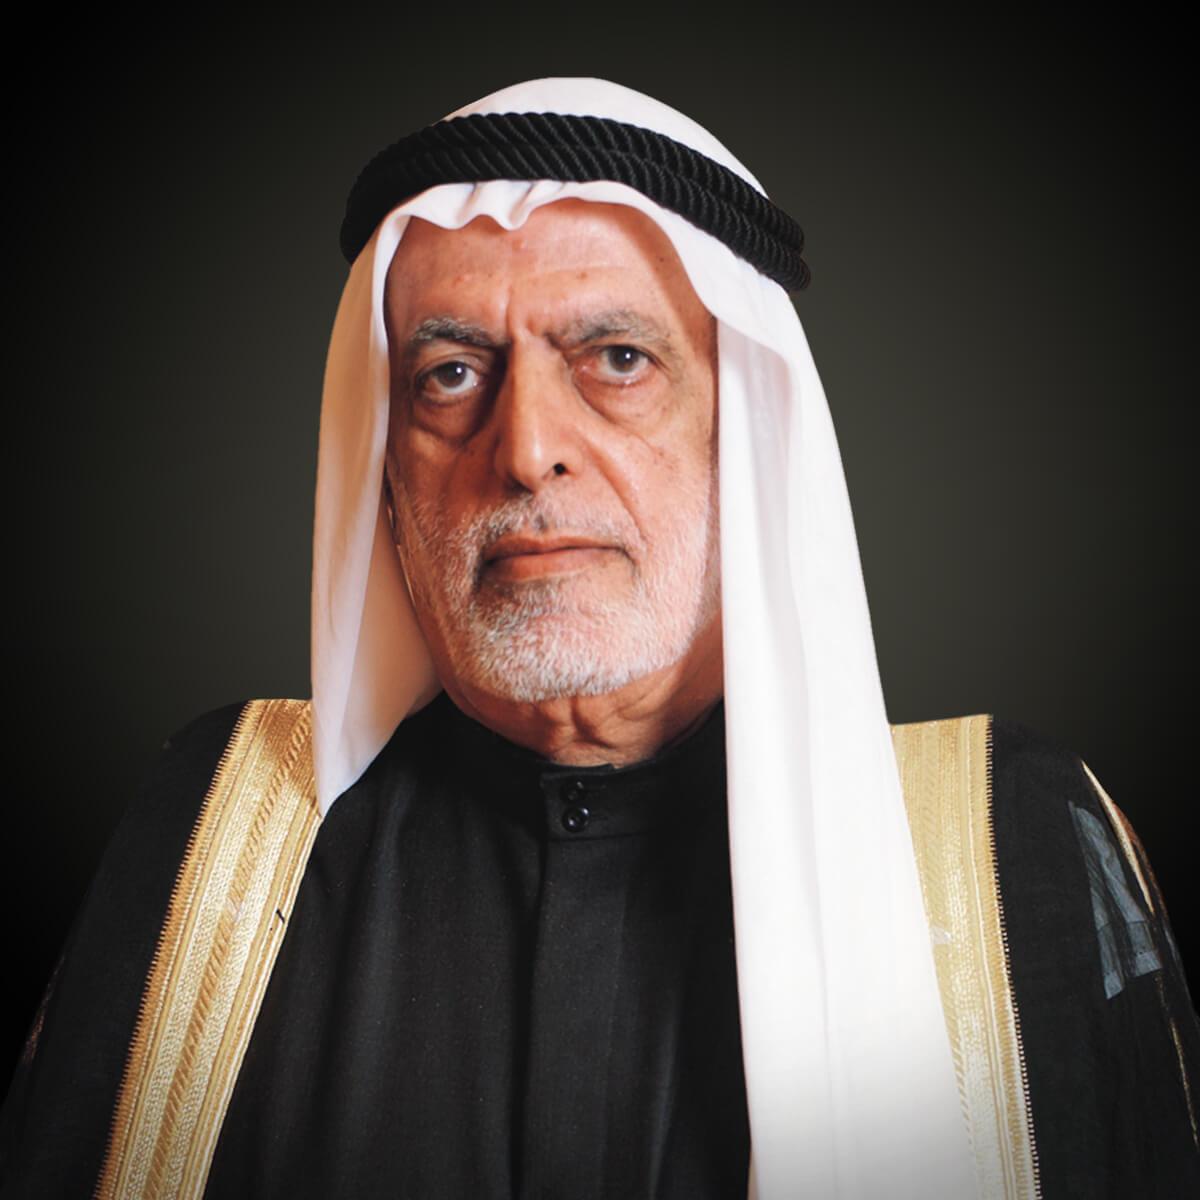 Abdulla bin Ahmad Al Ghurair & family